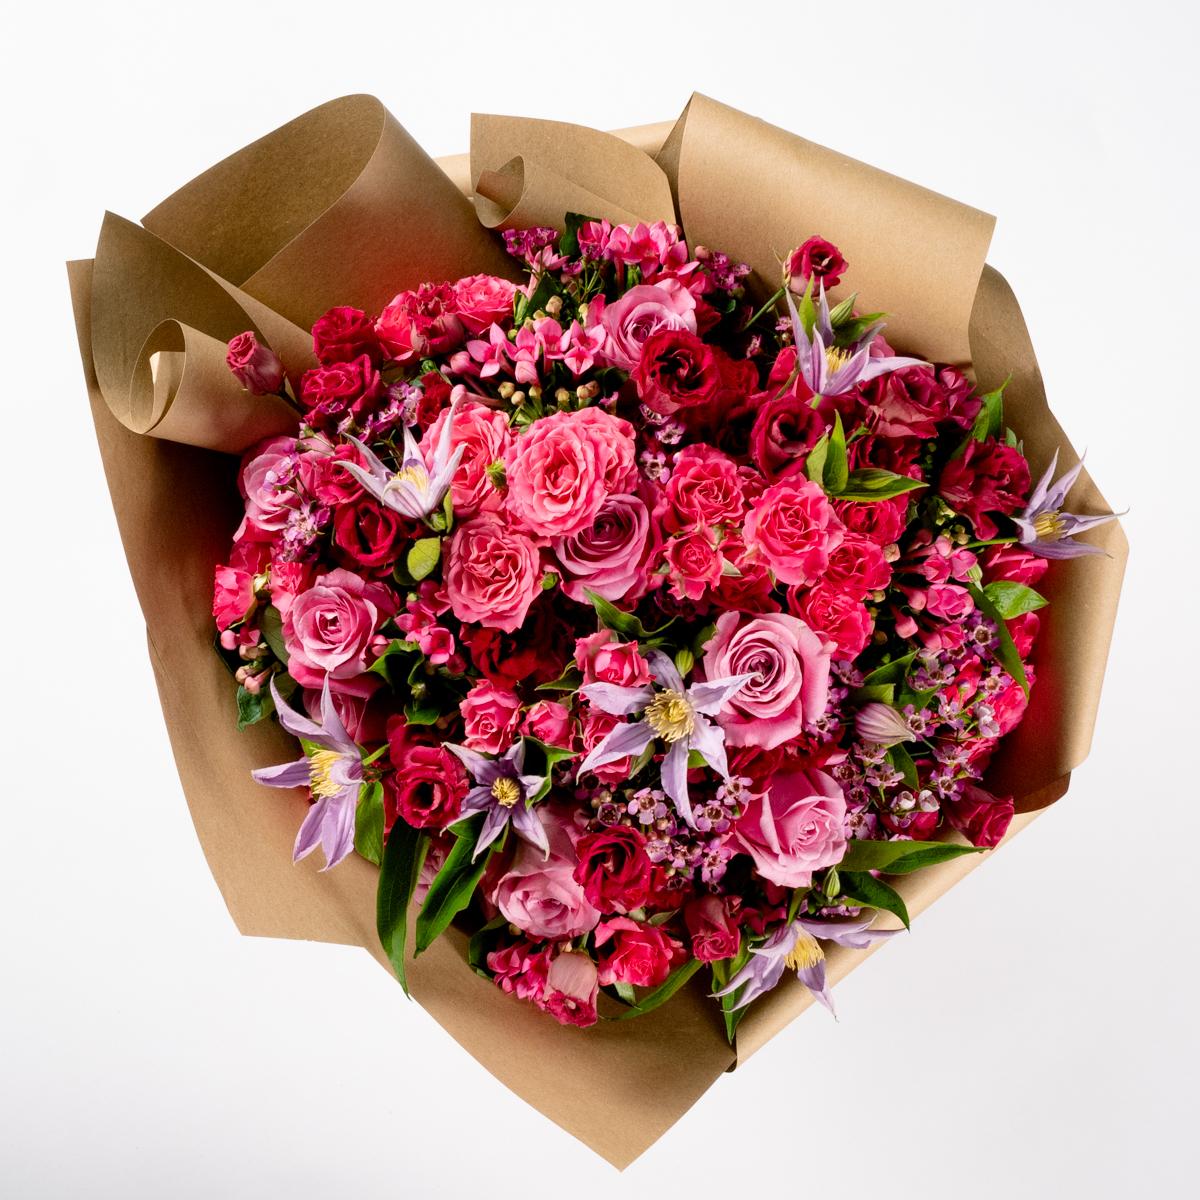 Bloom Flower Delivery | Romantic Bouquet